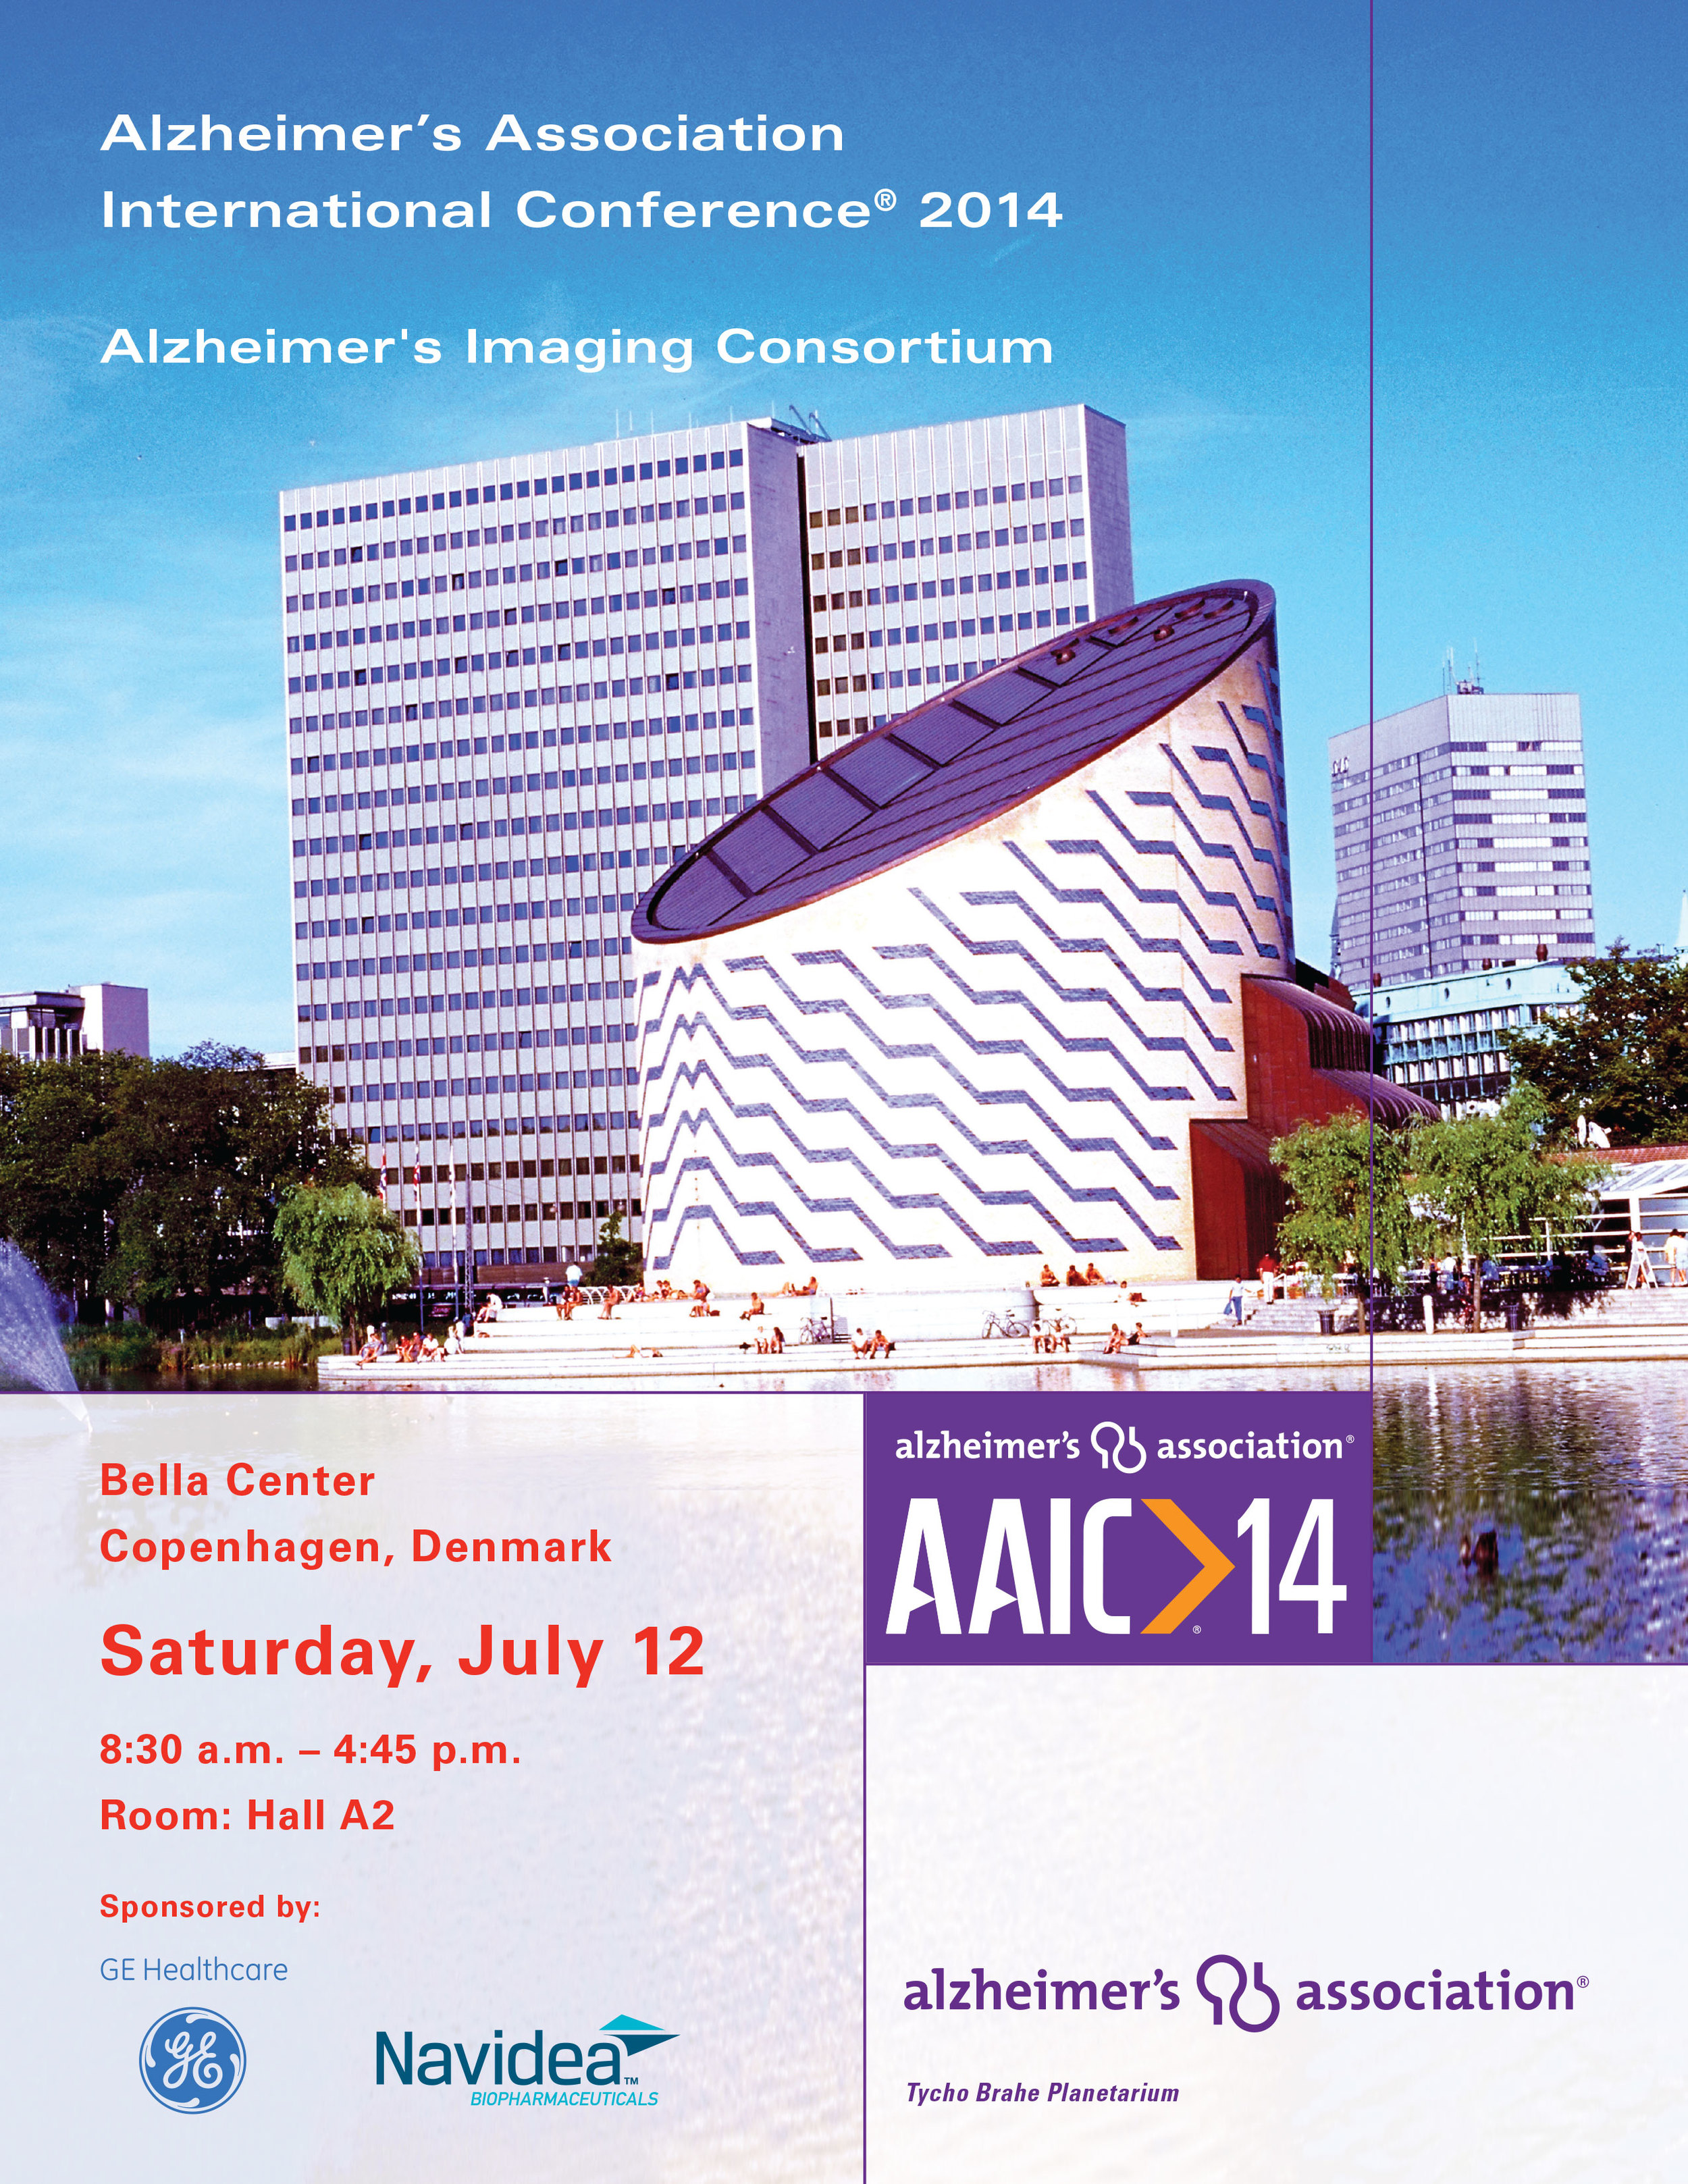 AAIC14 ALZHEIMER'S IMAGING CONSORTIUM PROGRAM BOOK